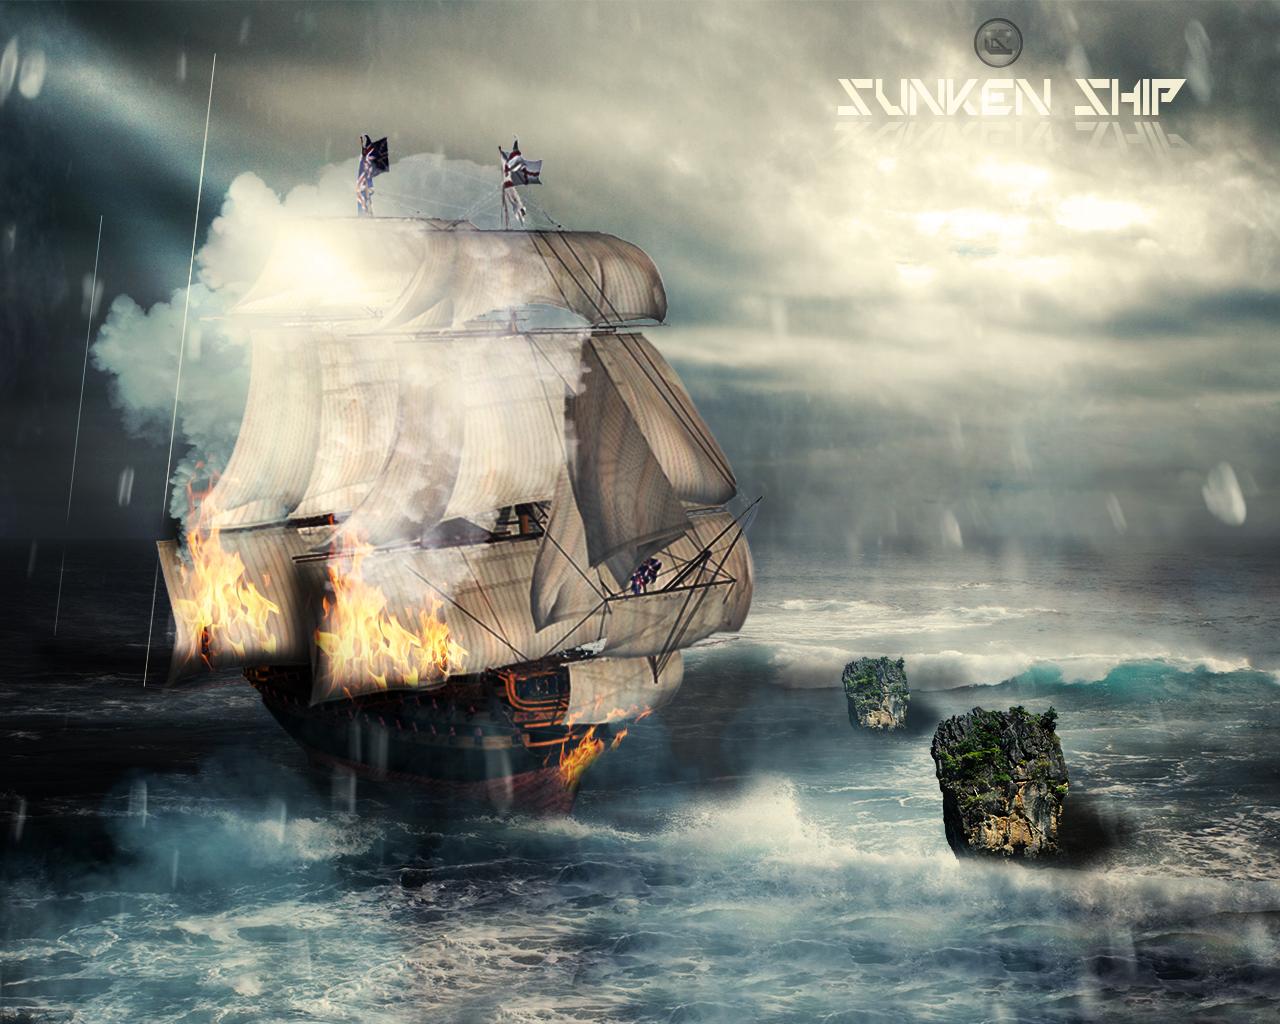 Sunken Ship Wallpaper By CLoSeDesign